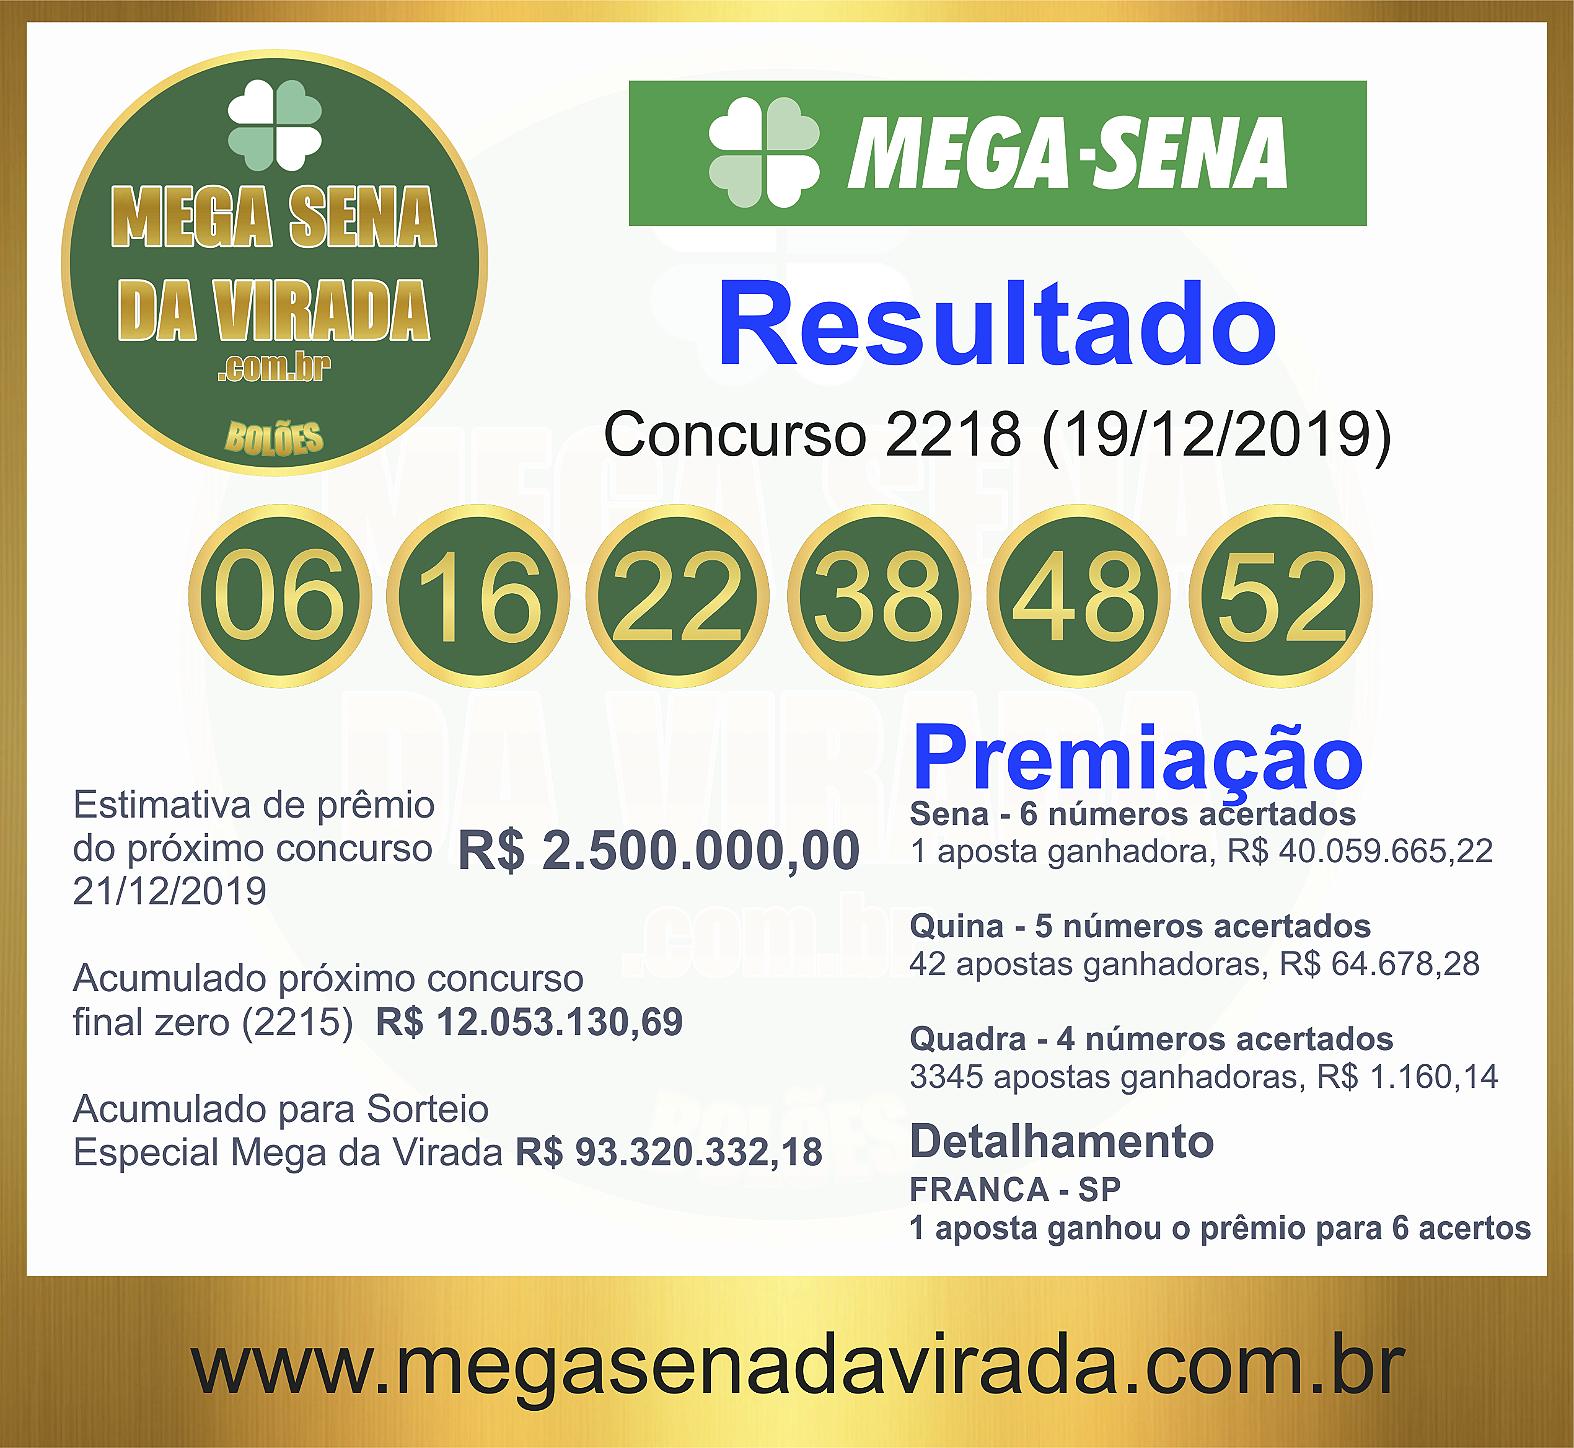 Mega Sena Concurso 2218 19/12/2019